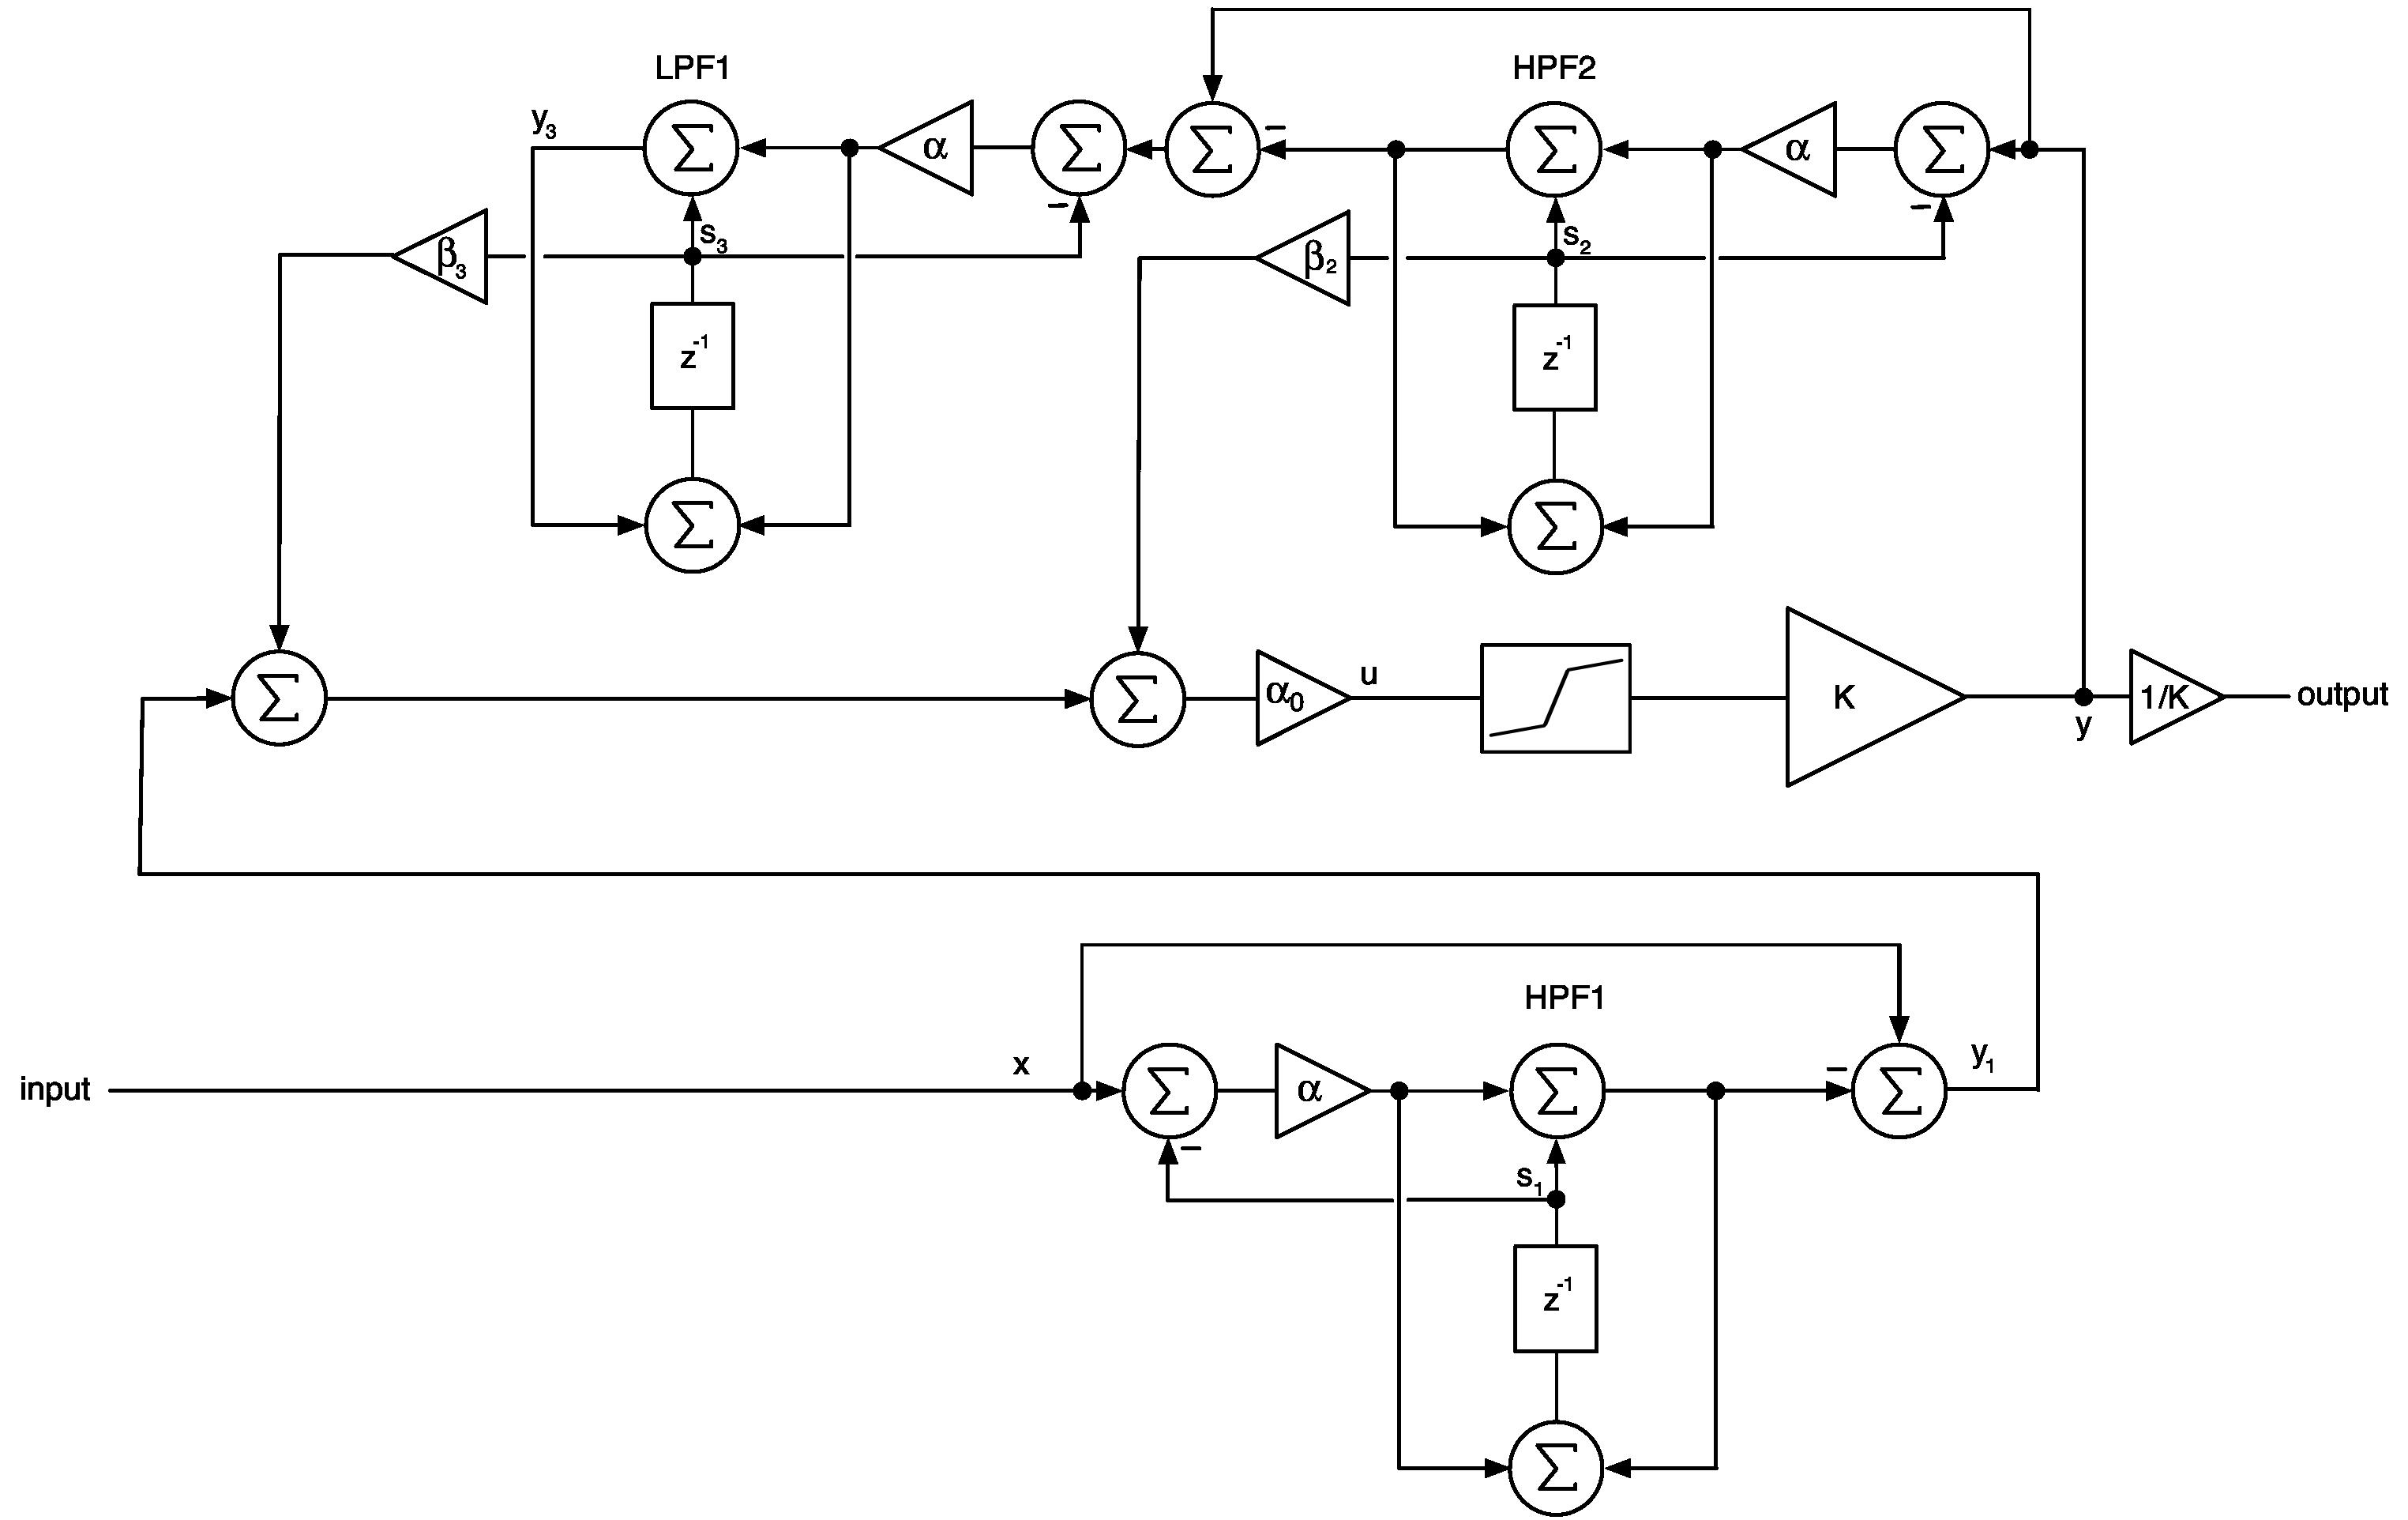 Rackafx Virtual Analog Korg35 Hpf High Pass Filter Diagram Korg35hpf